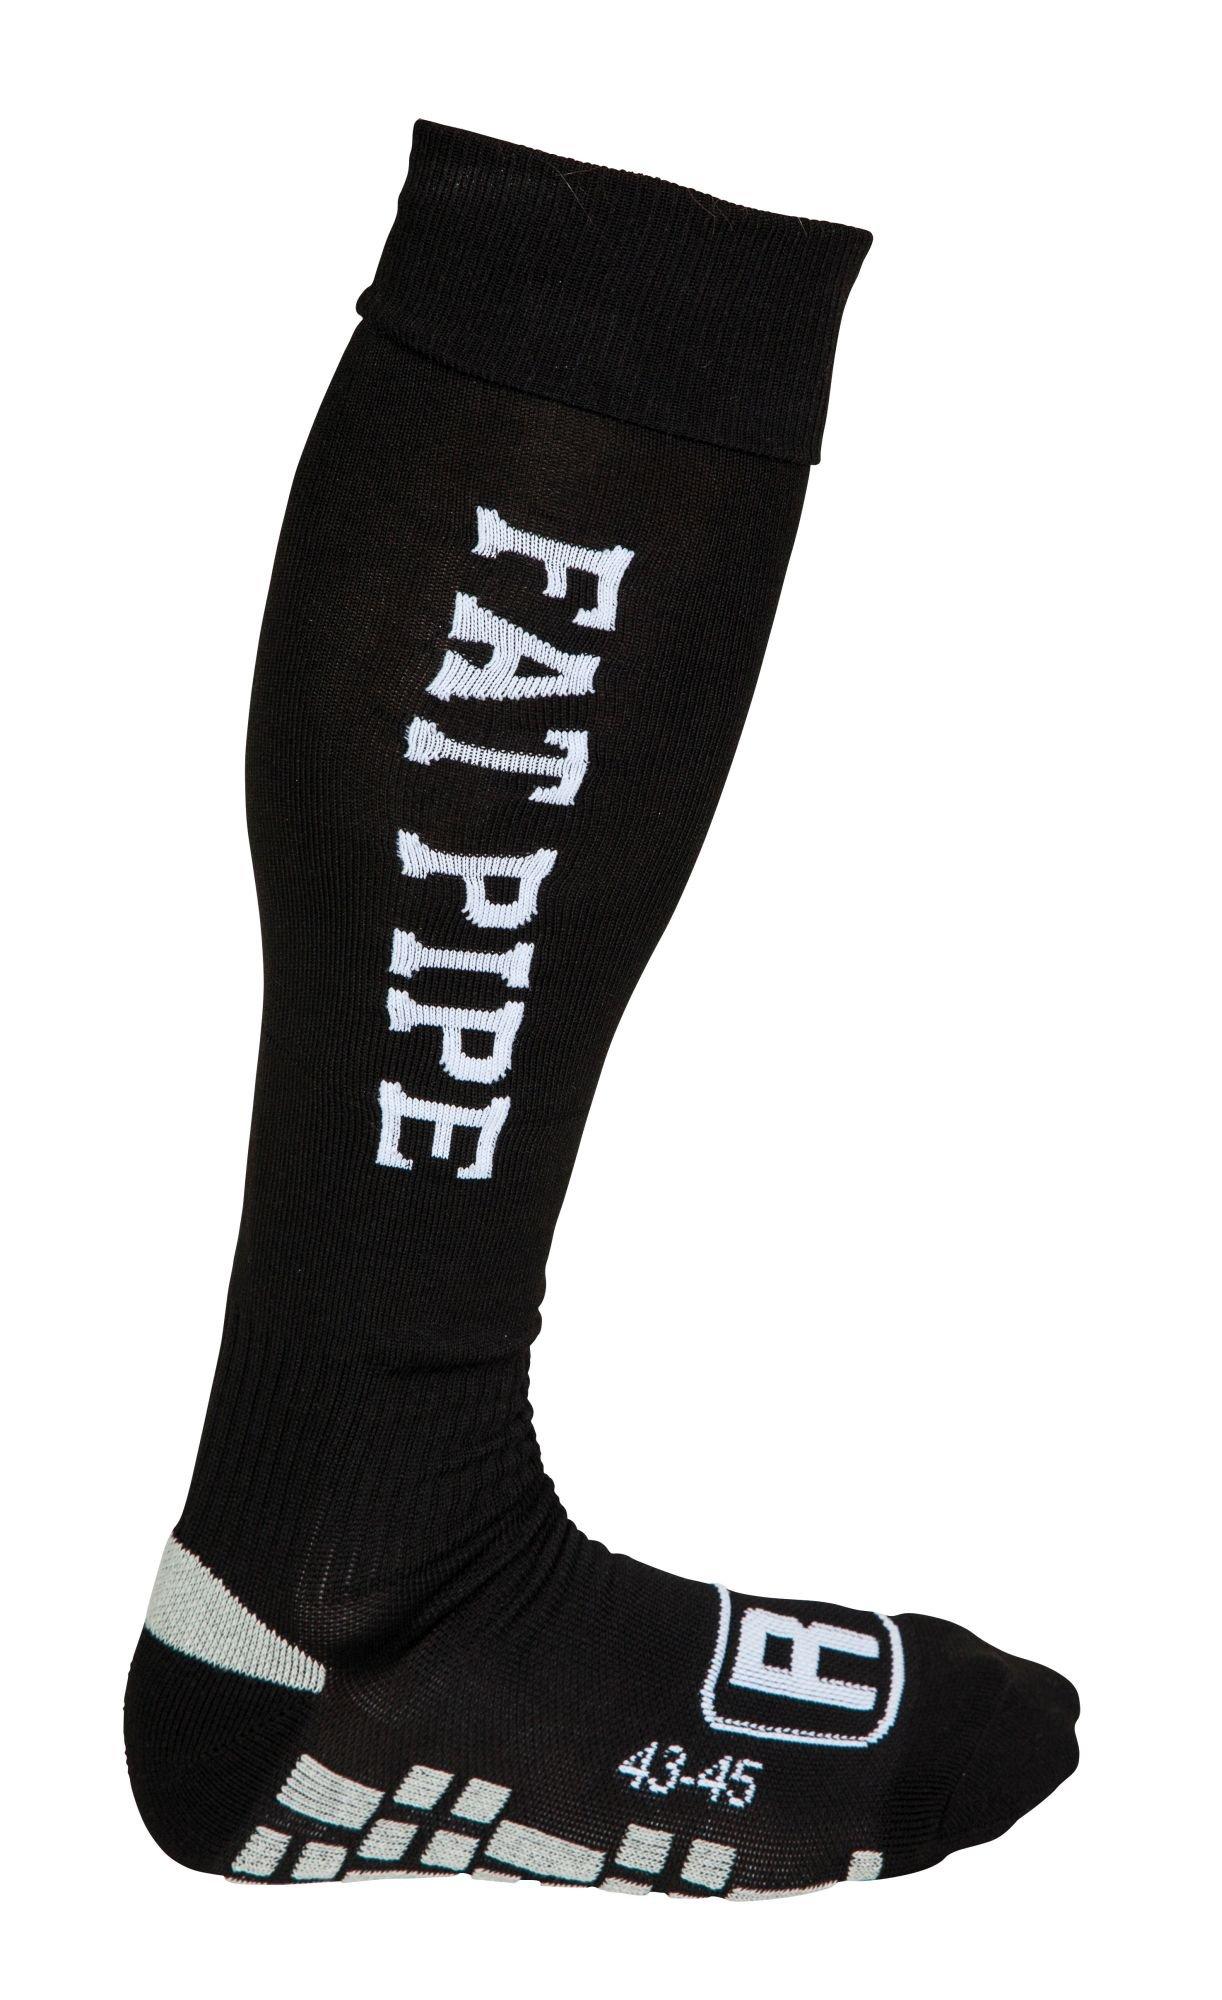 Fatpipe Player´s štulpny 36-39 černá